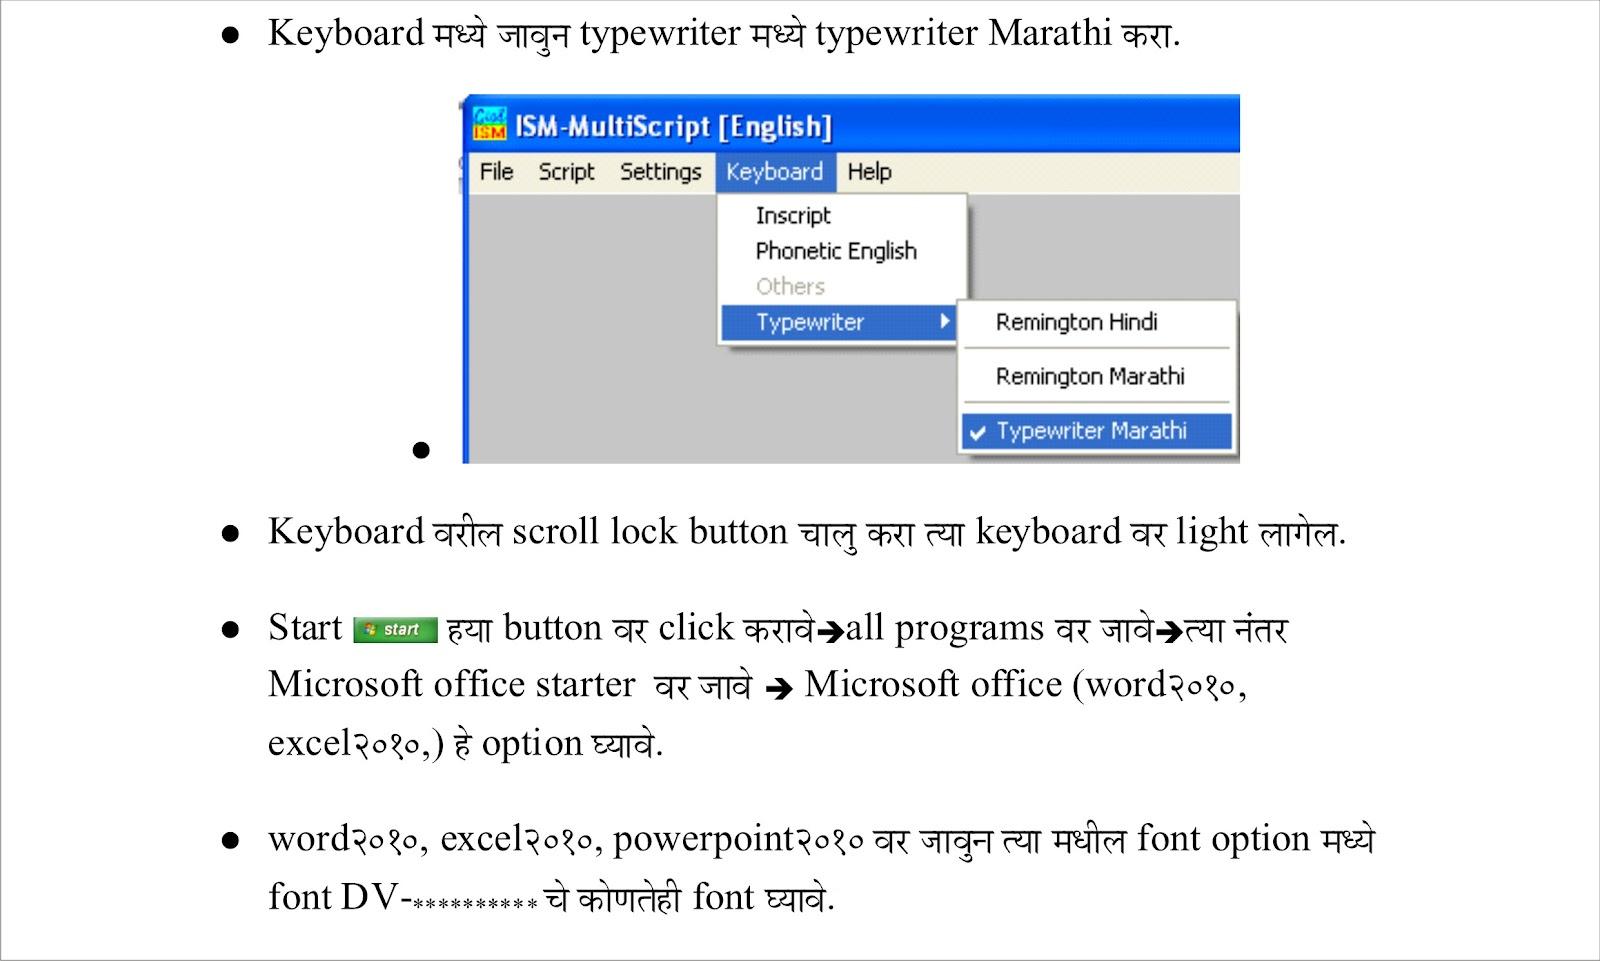 Gram panchyat operator training, Nilanga: Ism office marathi